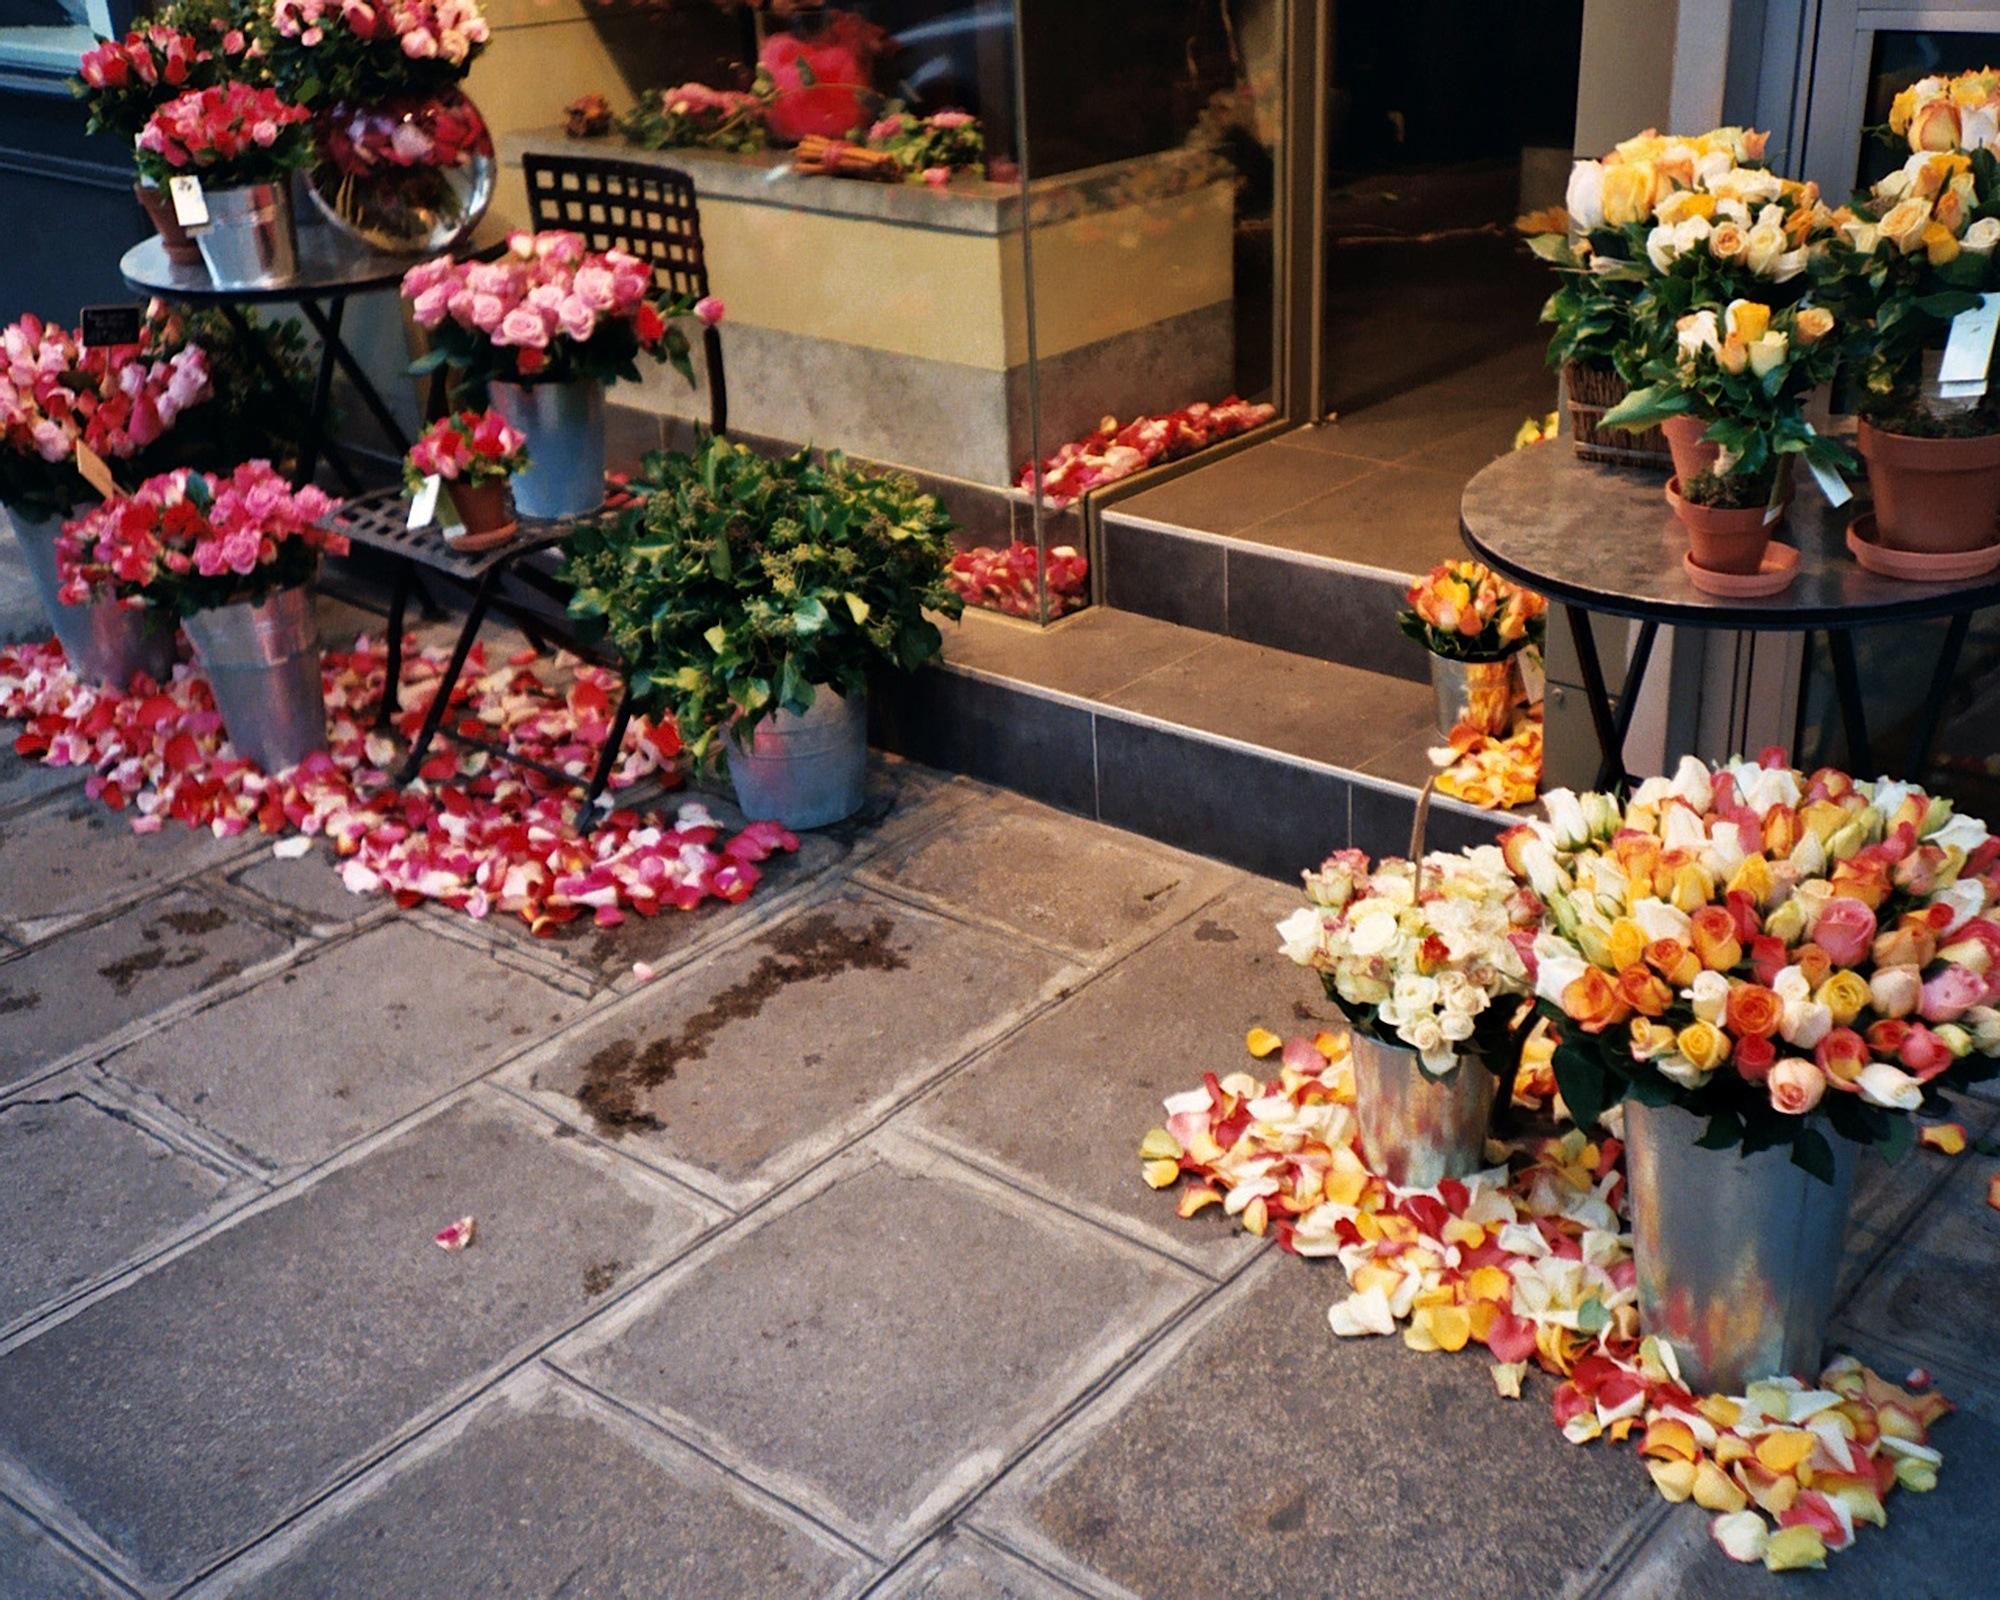 paris-flowers-16x20-021_25.jpg